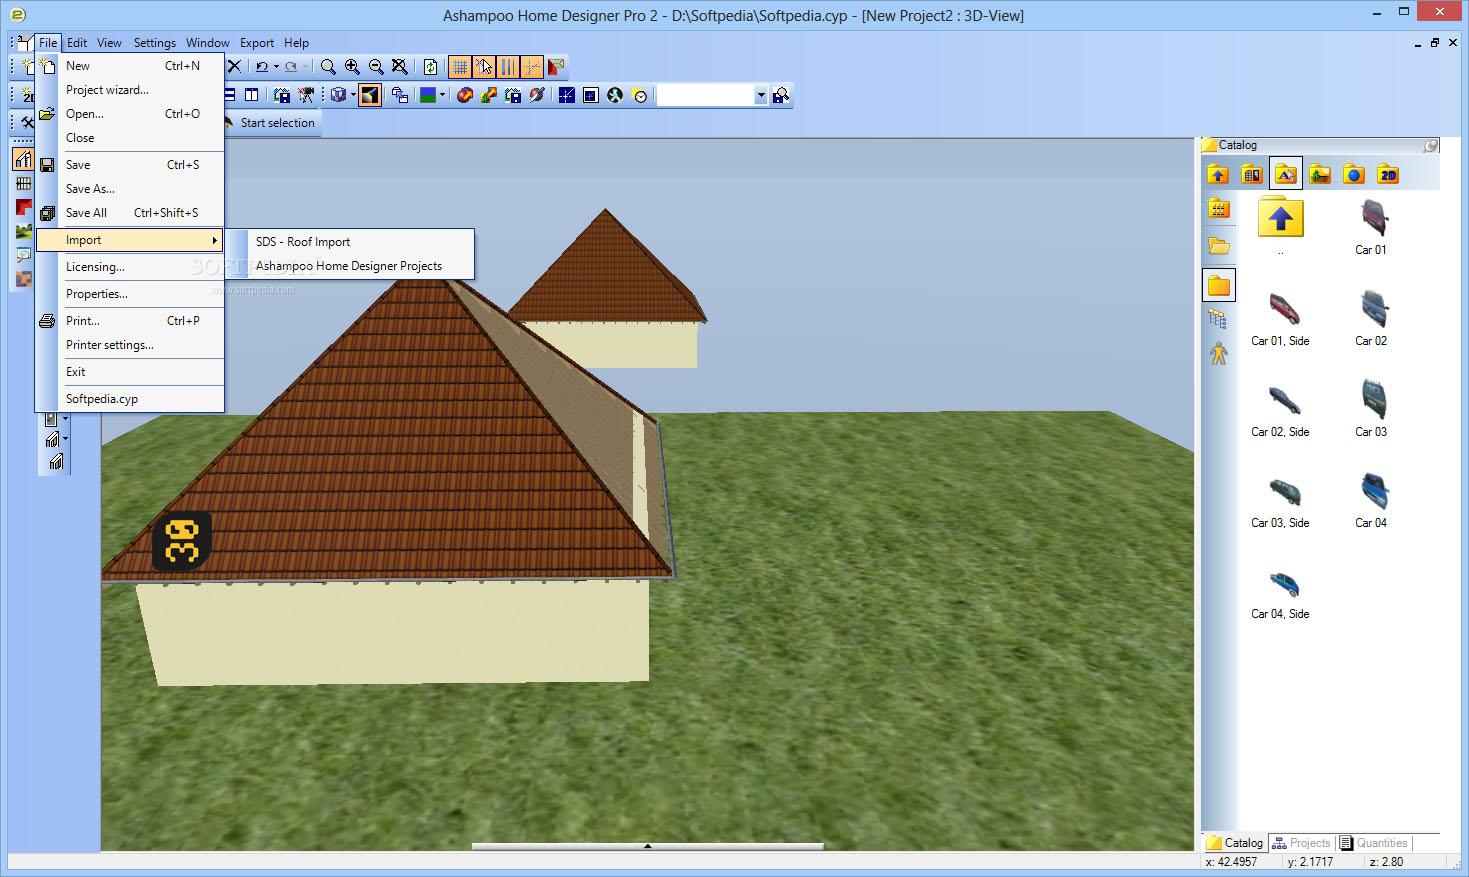 Ashampoo Home Designer Pro 2 V2 0 0 Professional Drawing Software A2z P30 Download Full